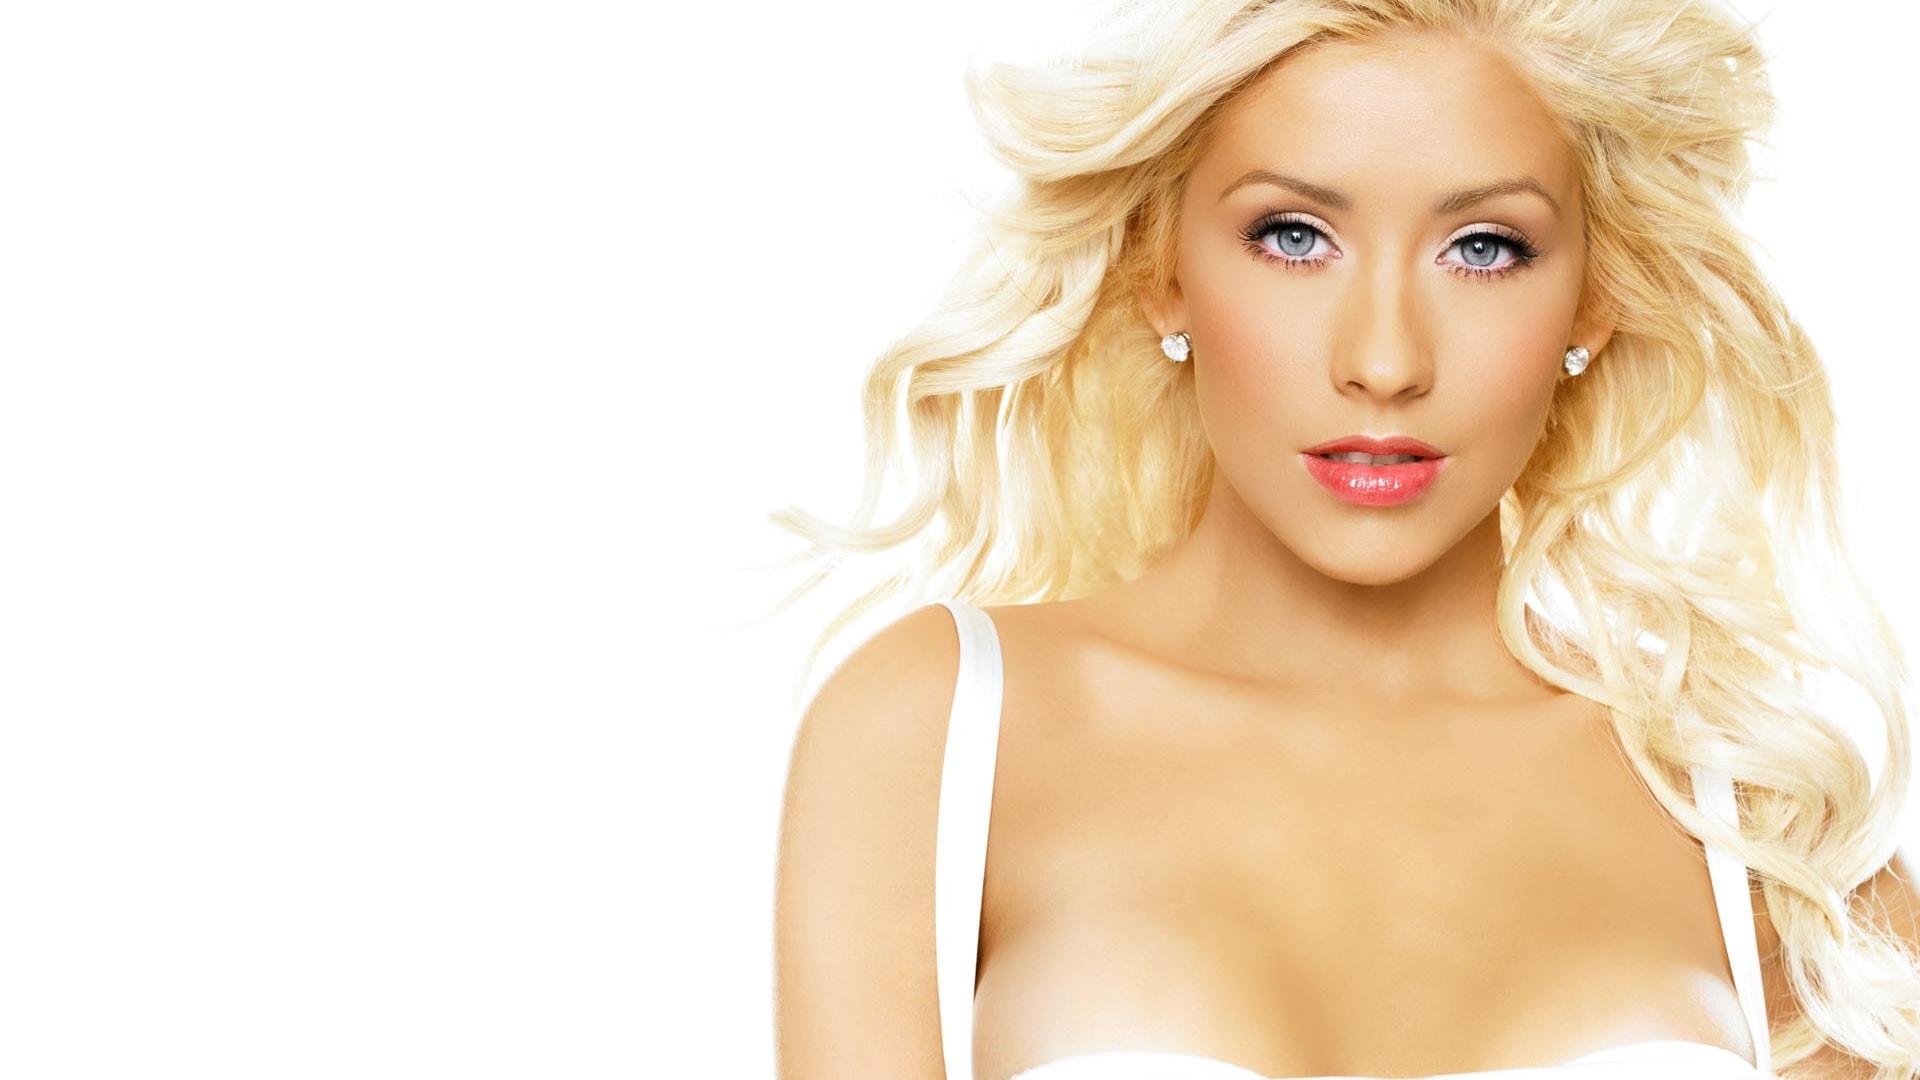 Christina Aguilera Wallpapers hd